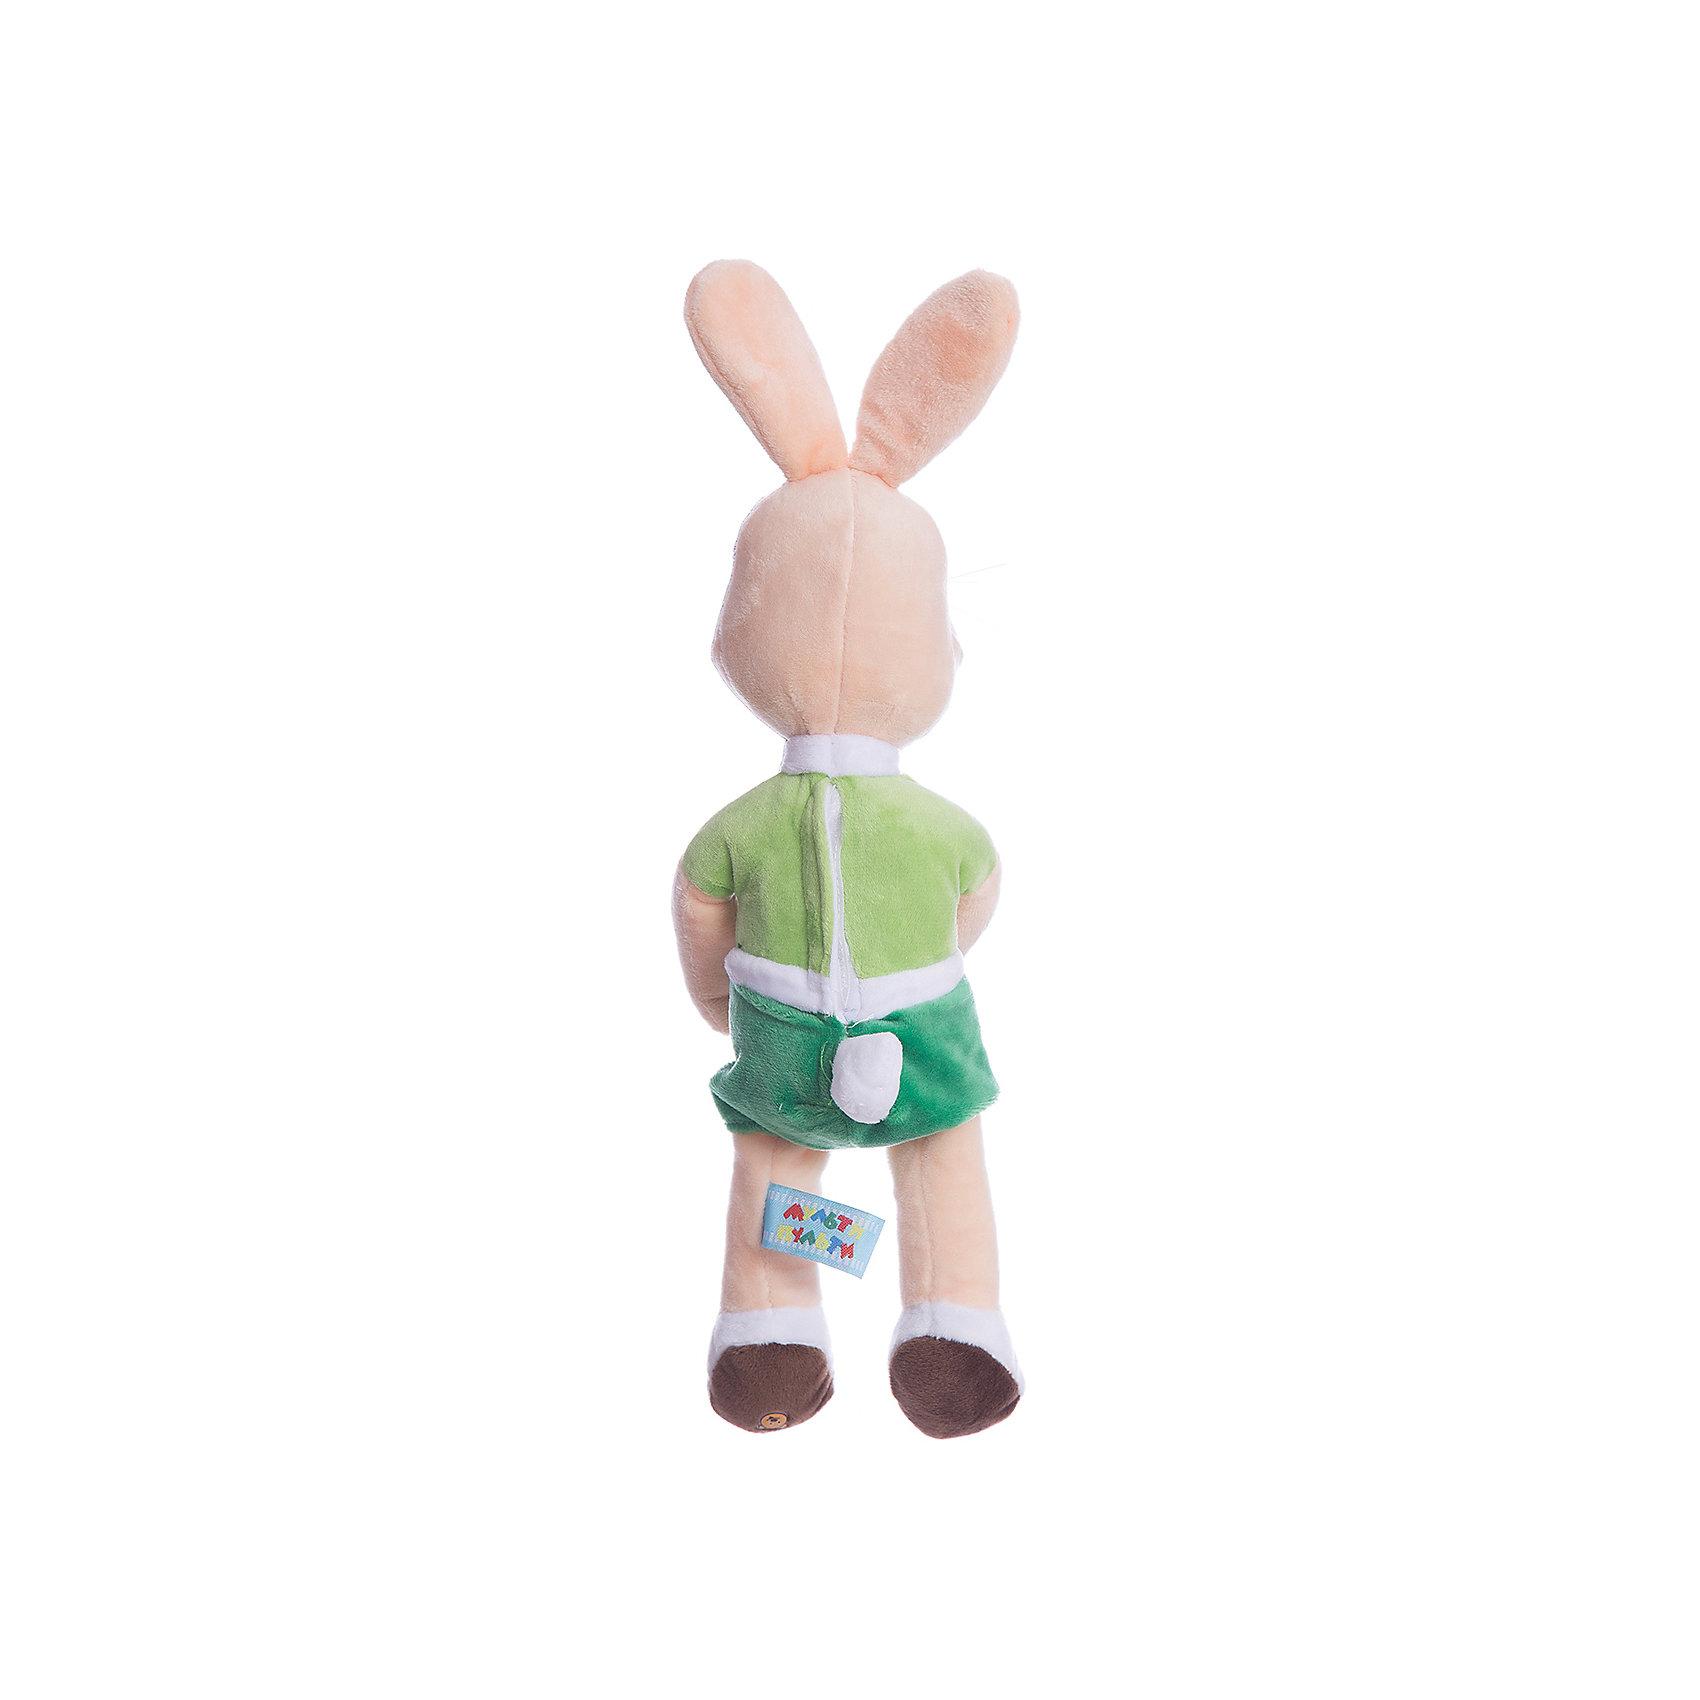 Мягкая игрушка Заяц с морковкой, МУЛЬТИ-ПУЛЬТИ от myToys